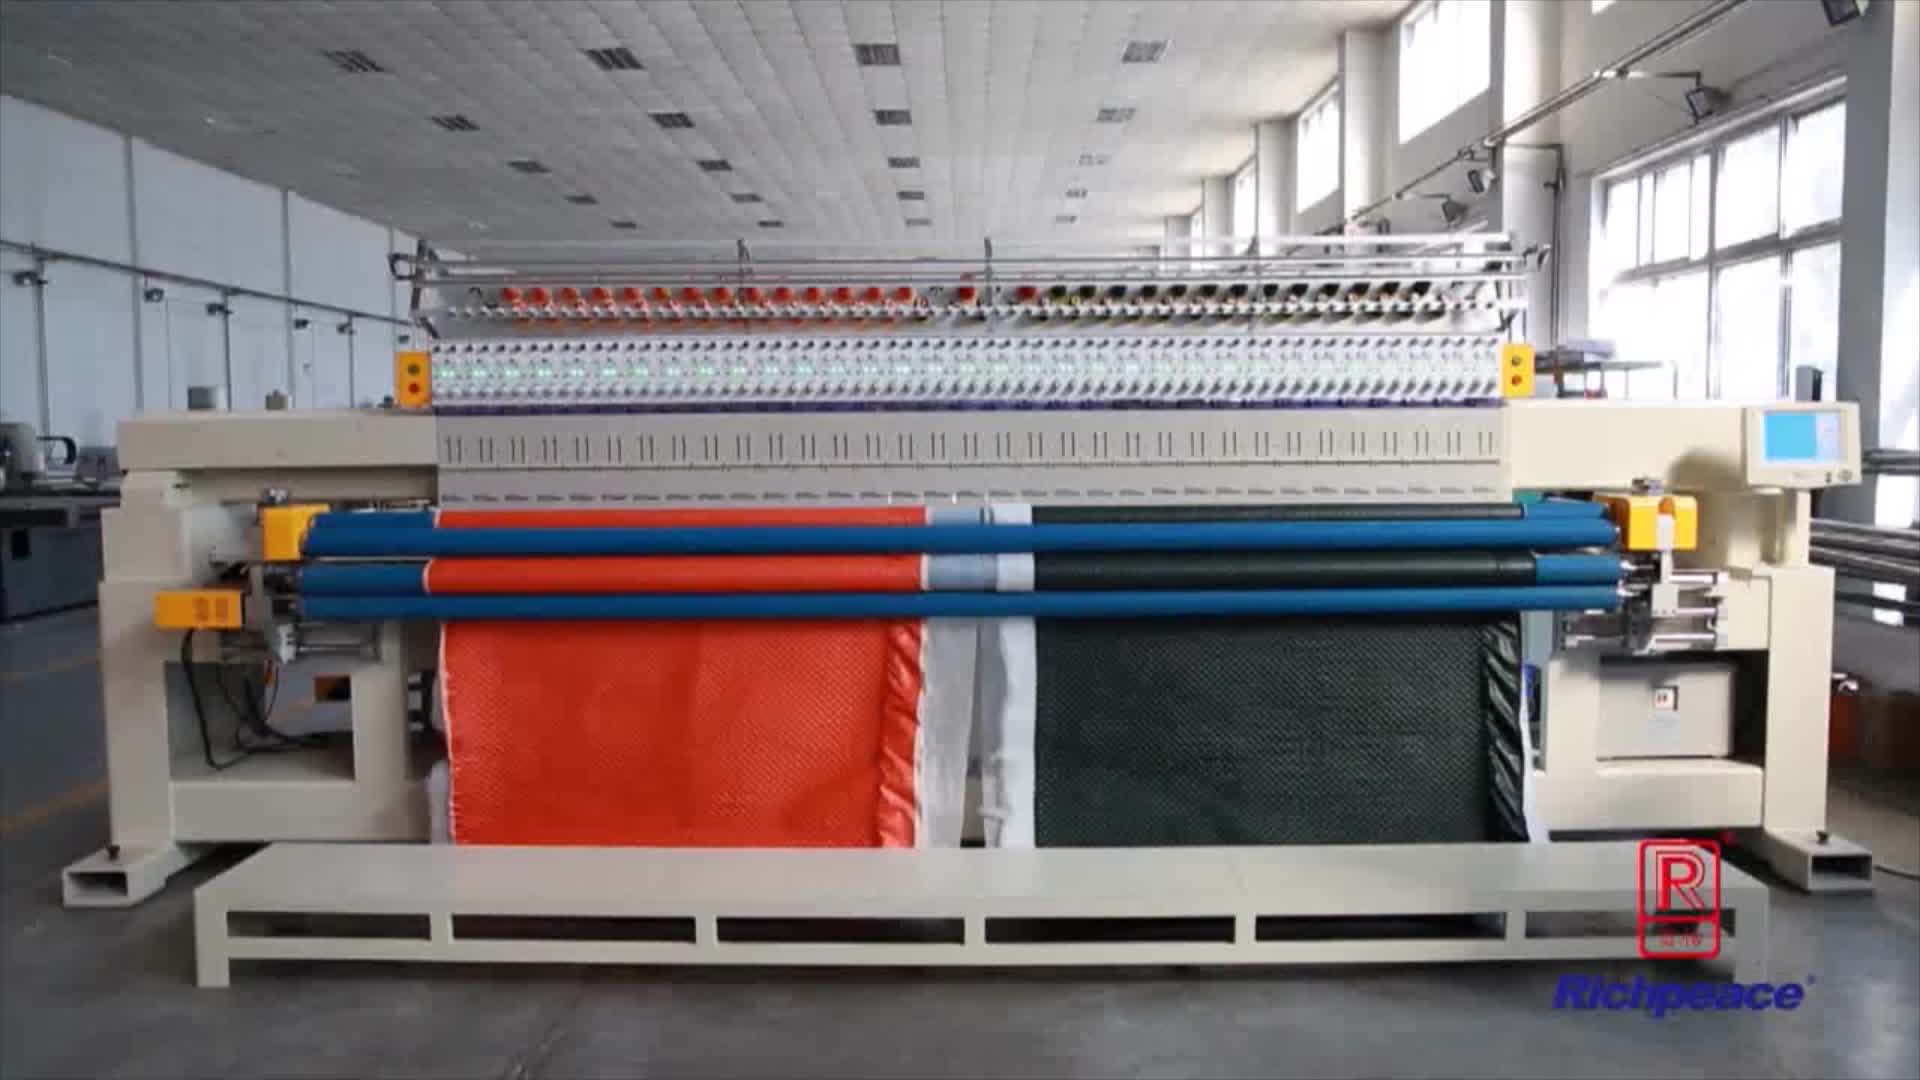 RPQ-E-166-Quilting & Embroidery Machine